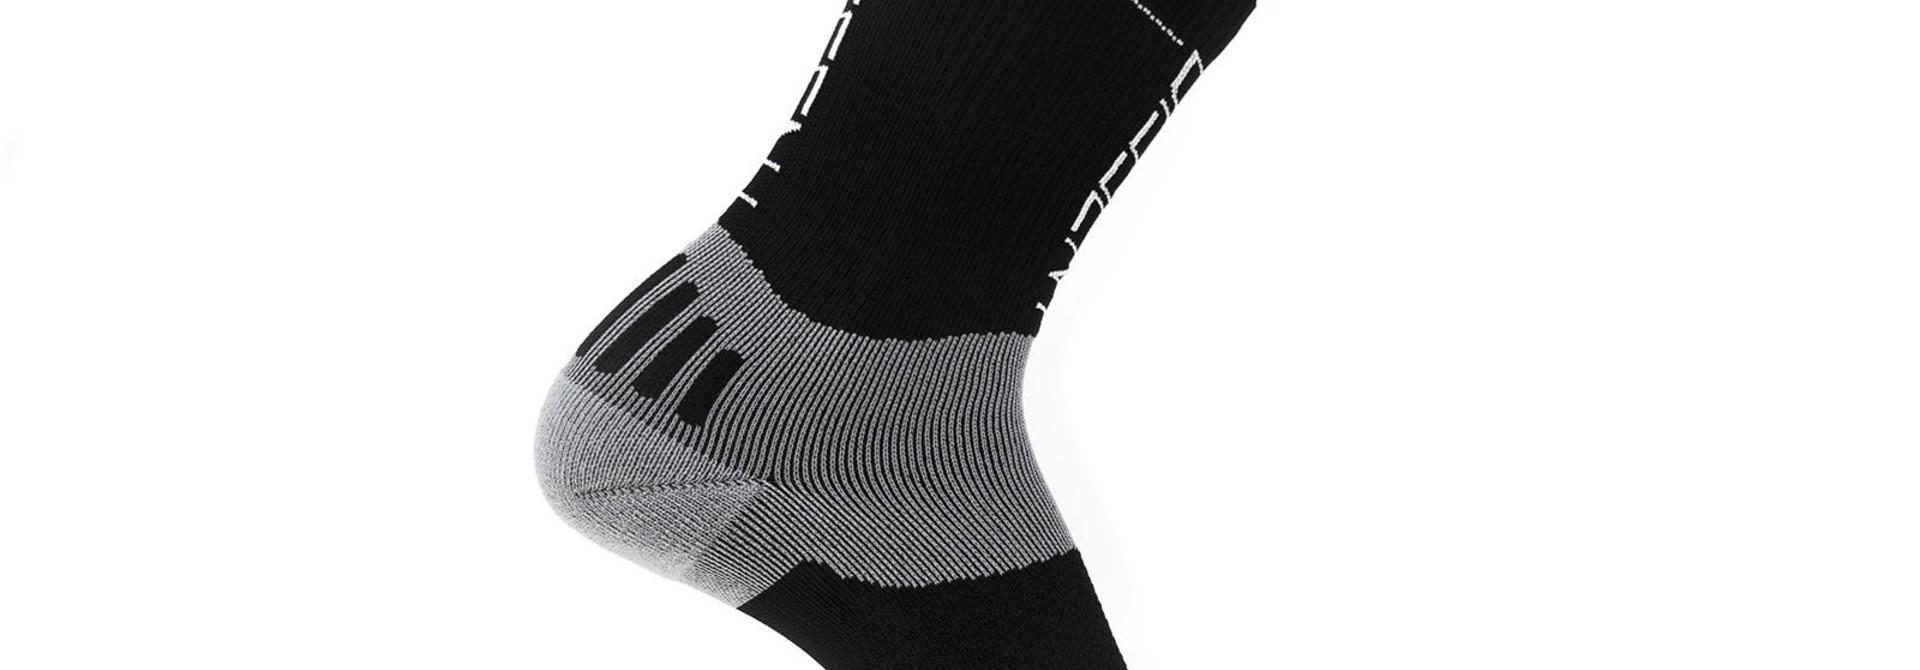 "Dissent, Supercrew Nano 6"", Compression socks, Black"